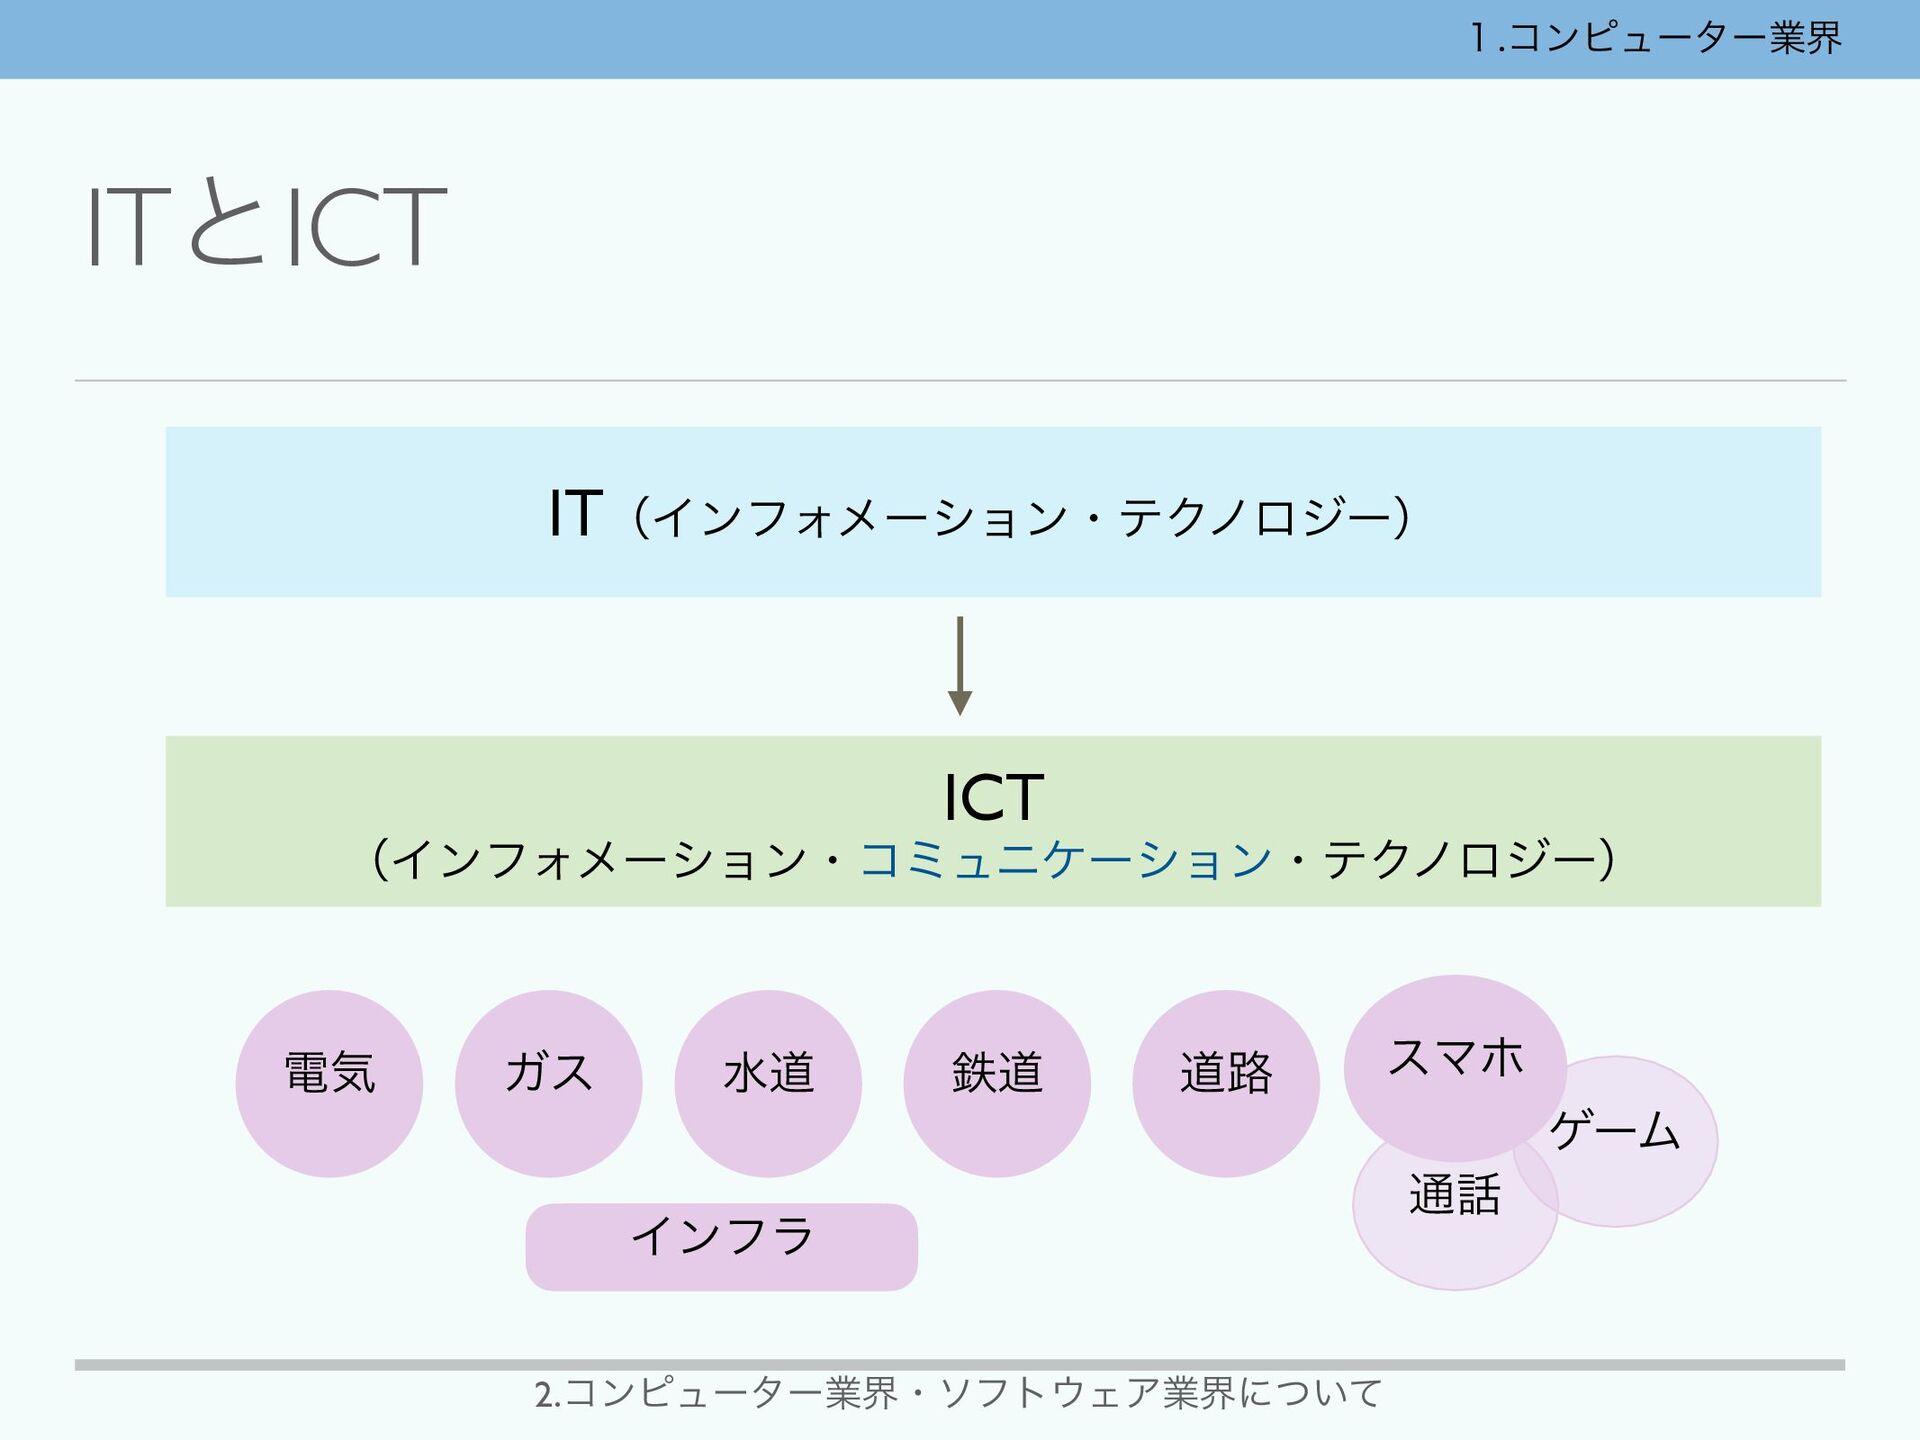 ITͱICT ITʢΠϯϑΥϝʔγϣϯɾςΫϊϩδʔʣ IC T  ʢΠϯϑΥϝʔγϣϯɾίϛ...